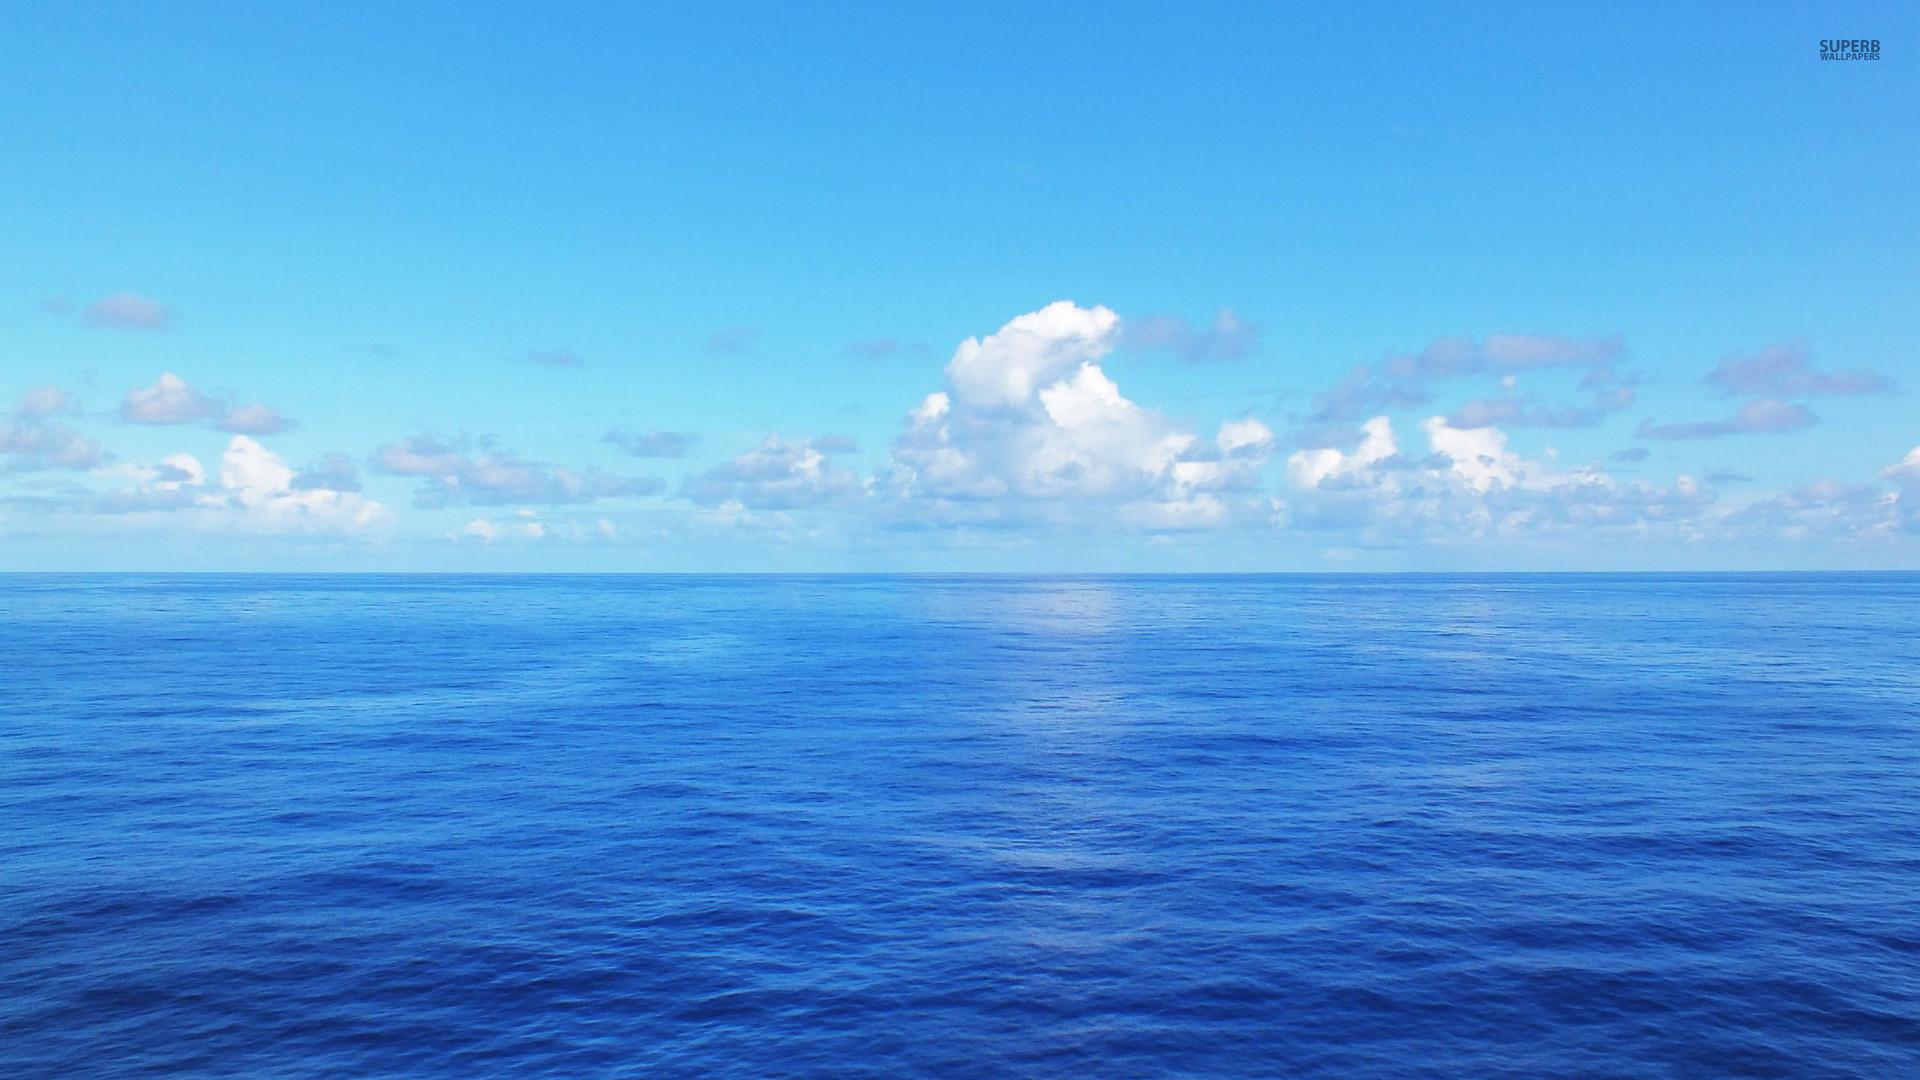 Ocean wallpapers 1920x1080 58 images - Wallpaper ocean blue ...